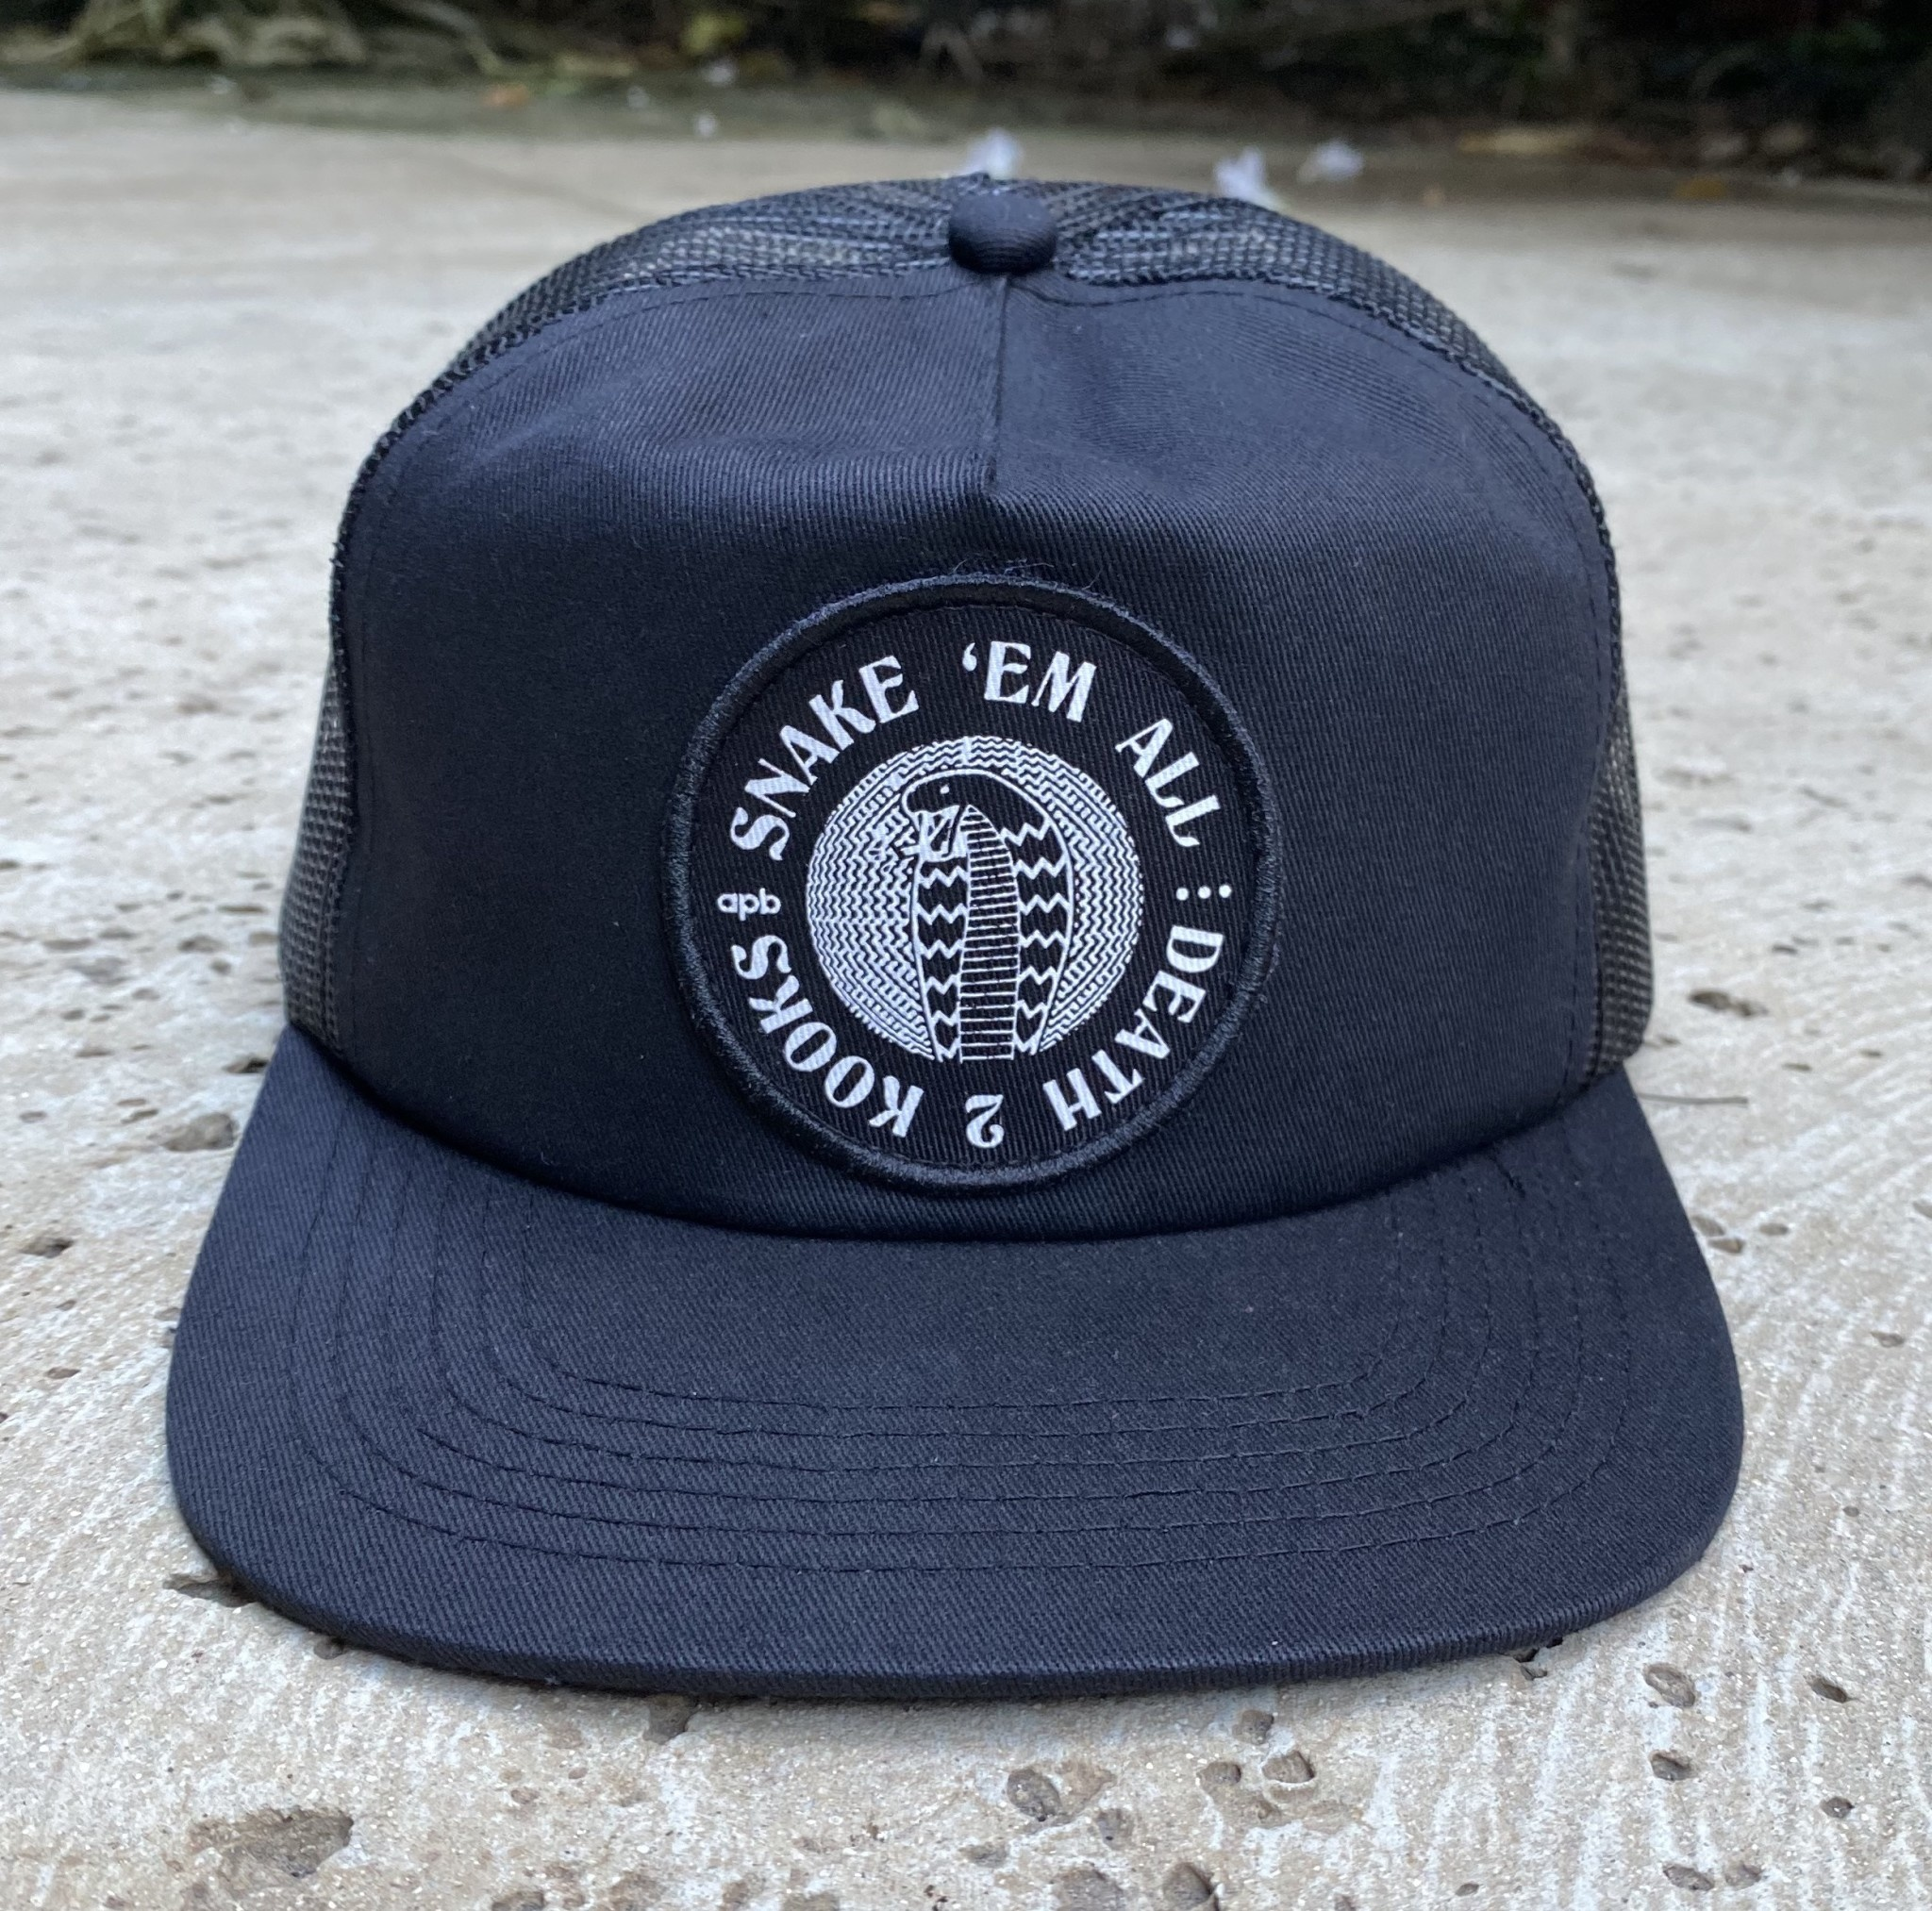 APB Skateshop Snake Em All Trucker Hat Black/Black